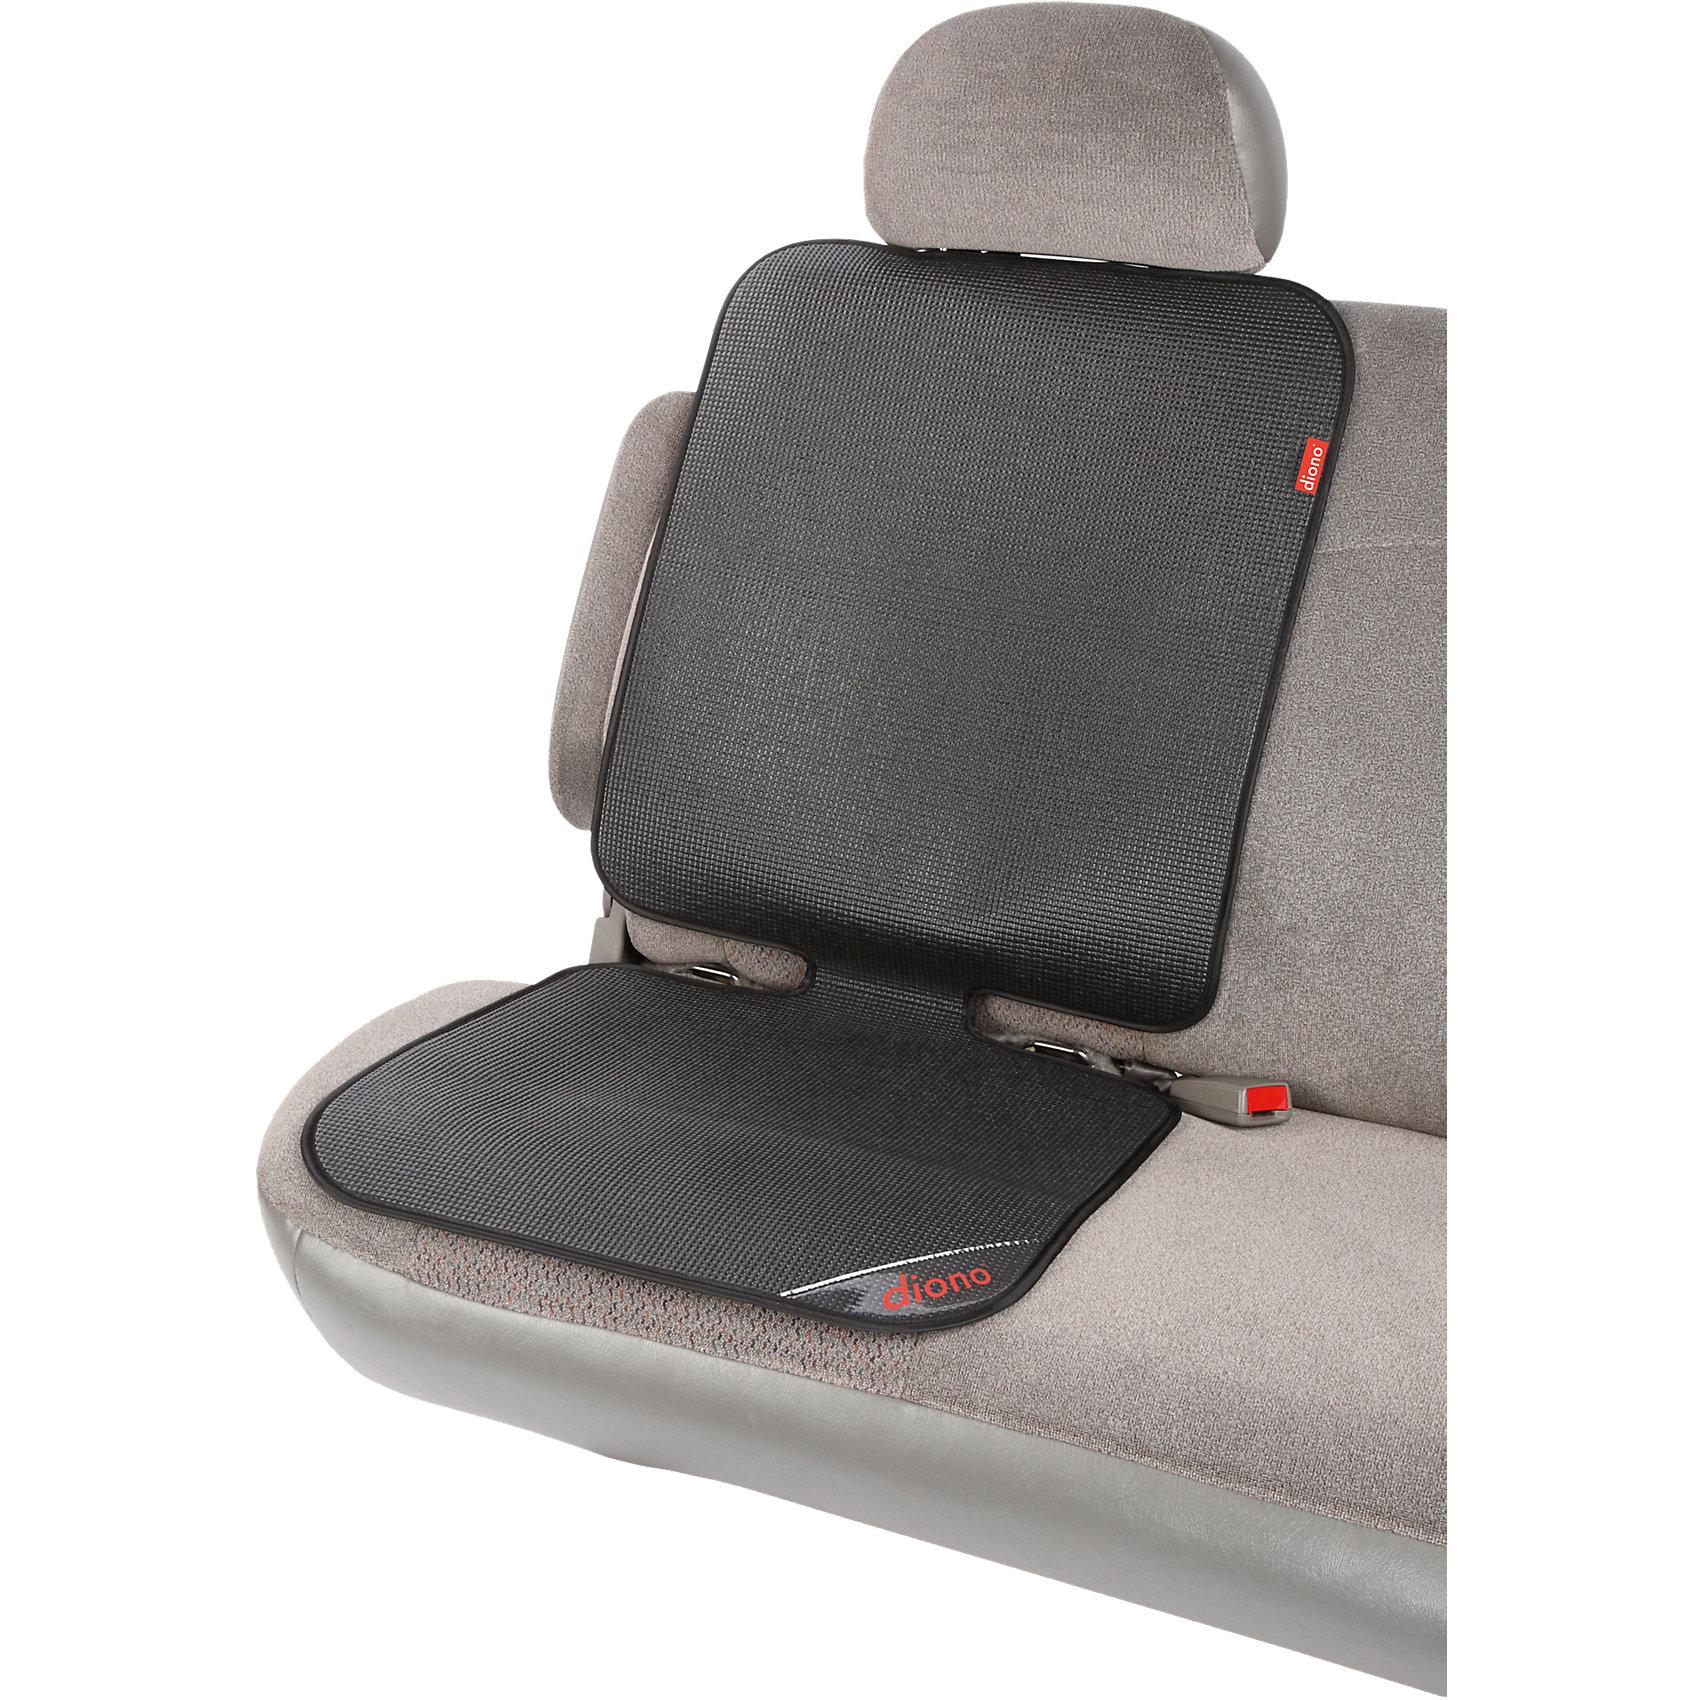 Diono Чехол для автомобильного сидения  Grip It , Diono, Black чехол для cпинки переднего автосиденья diono stuffnscuff